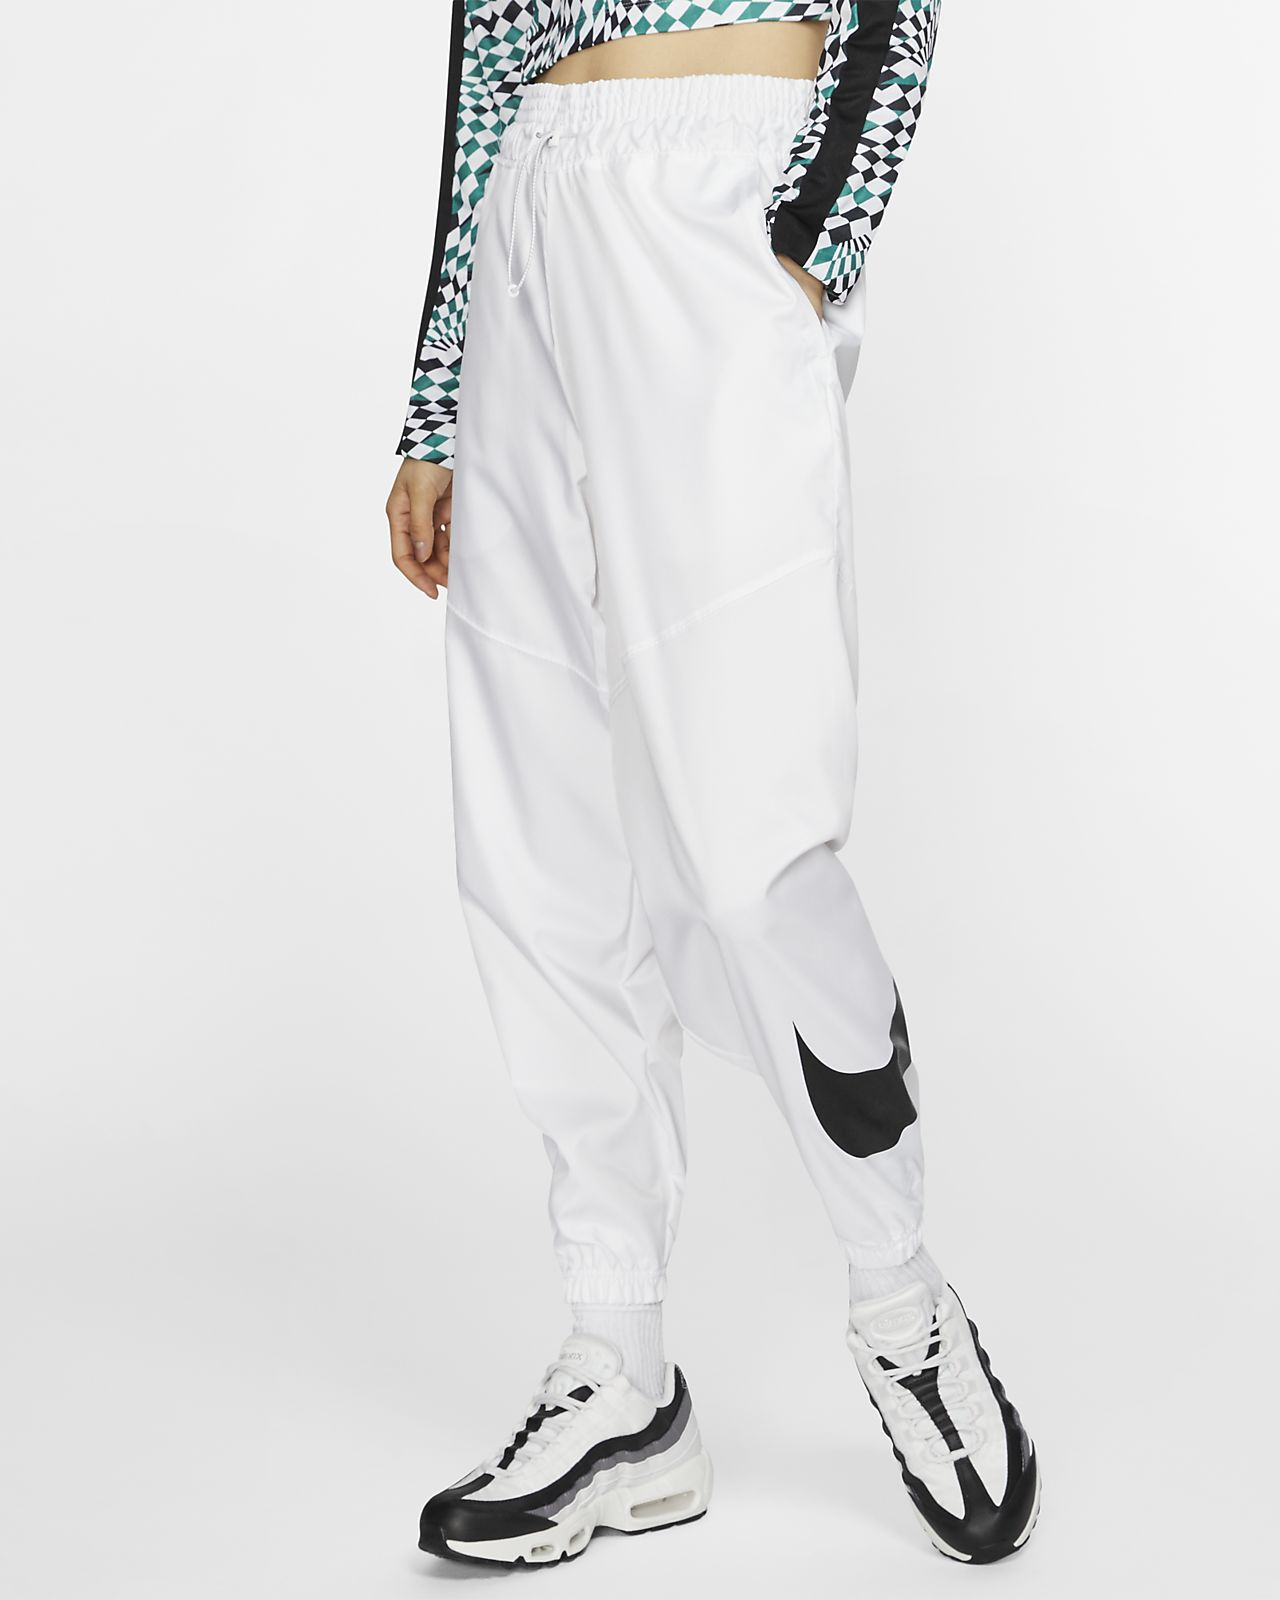 3f1ef9c91 Nike Sportswear Swoosh Woven Trousers. Nike.com GB